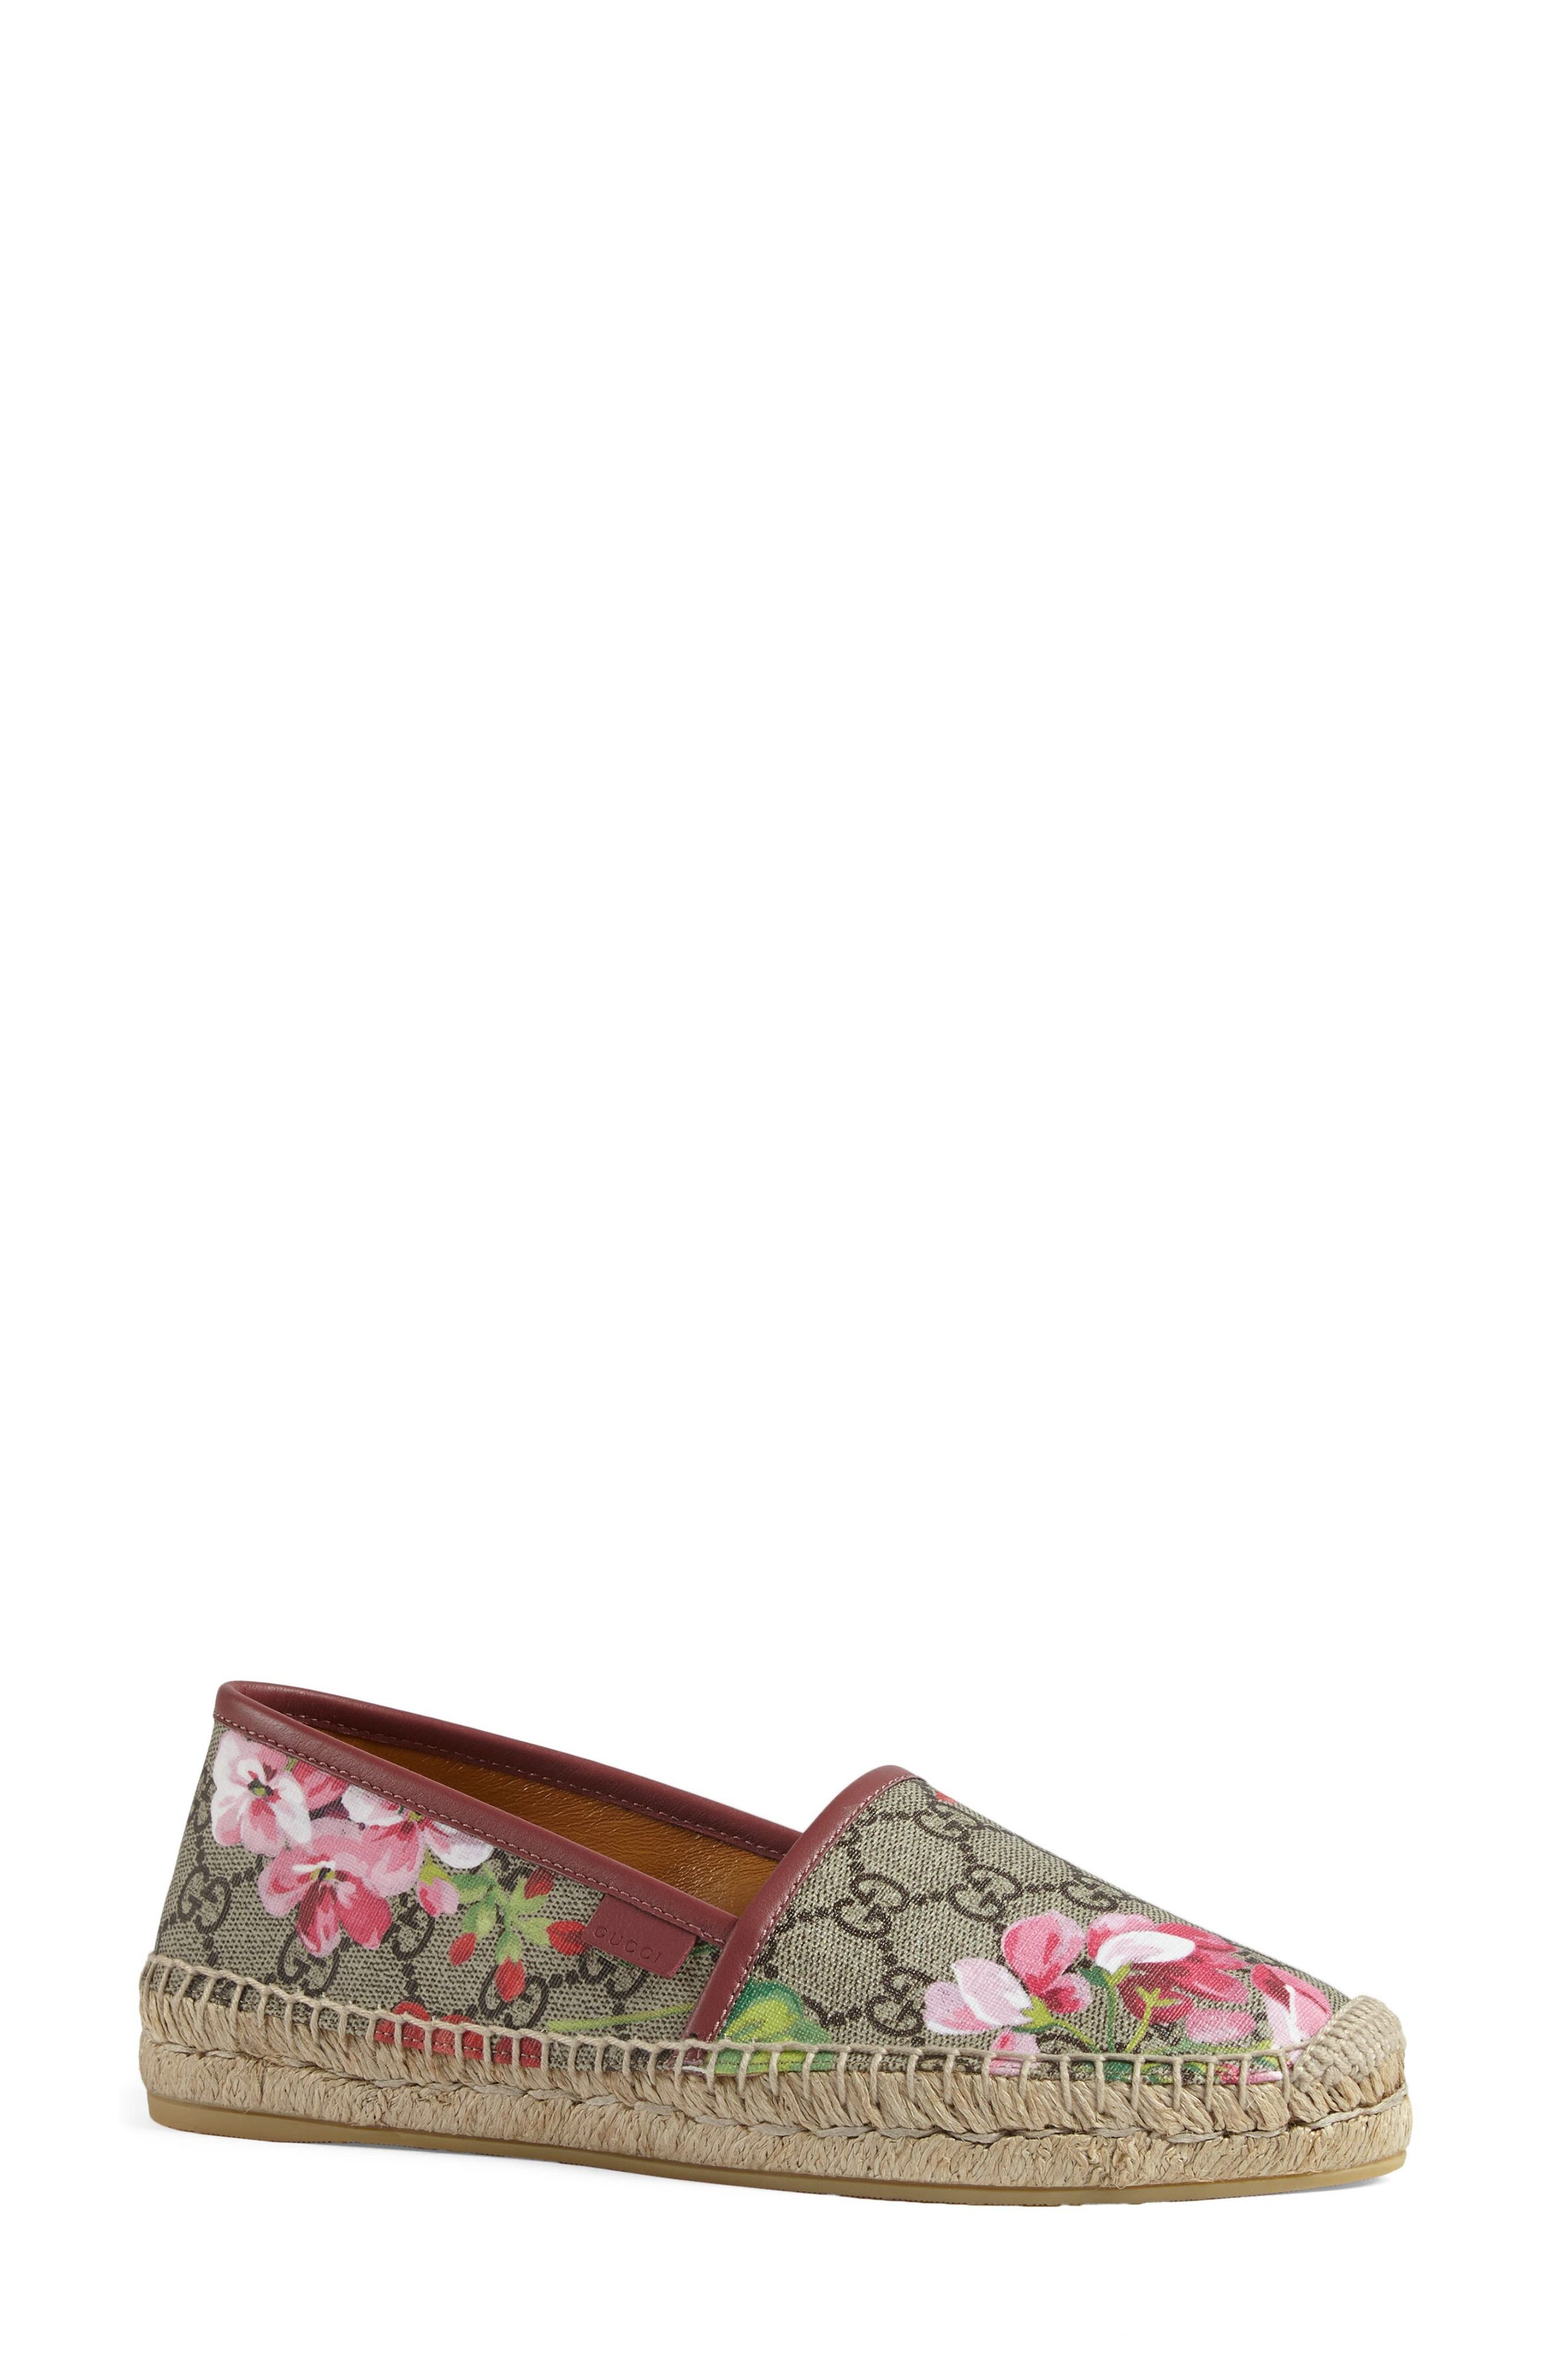 Alternate Image 3  - Gucci 'Pilar' Espadrille Slip-On Flat (Women)